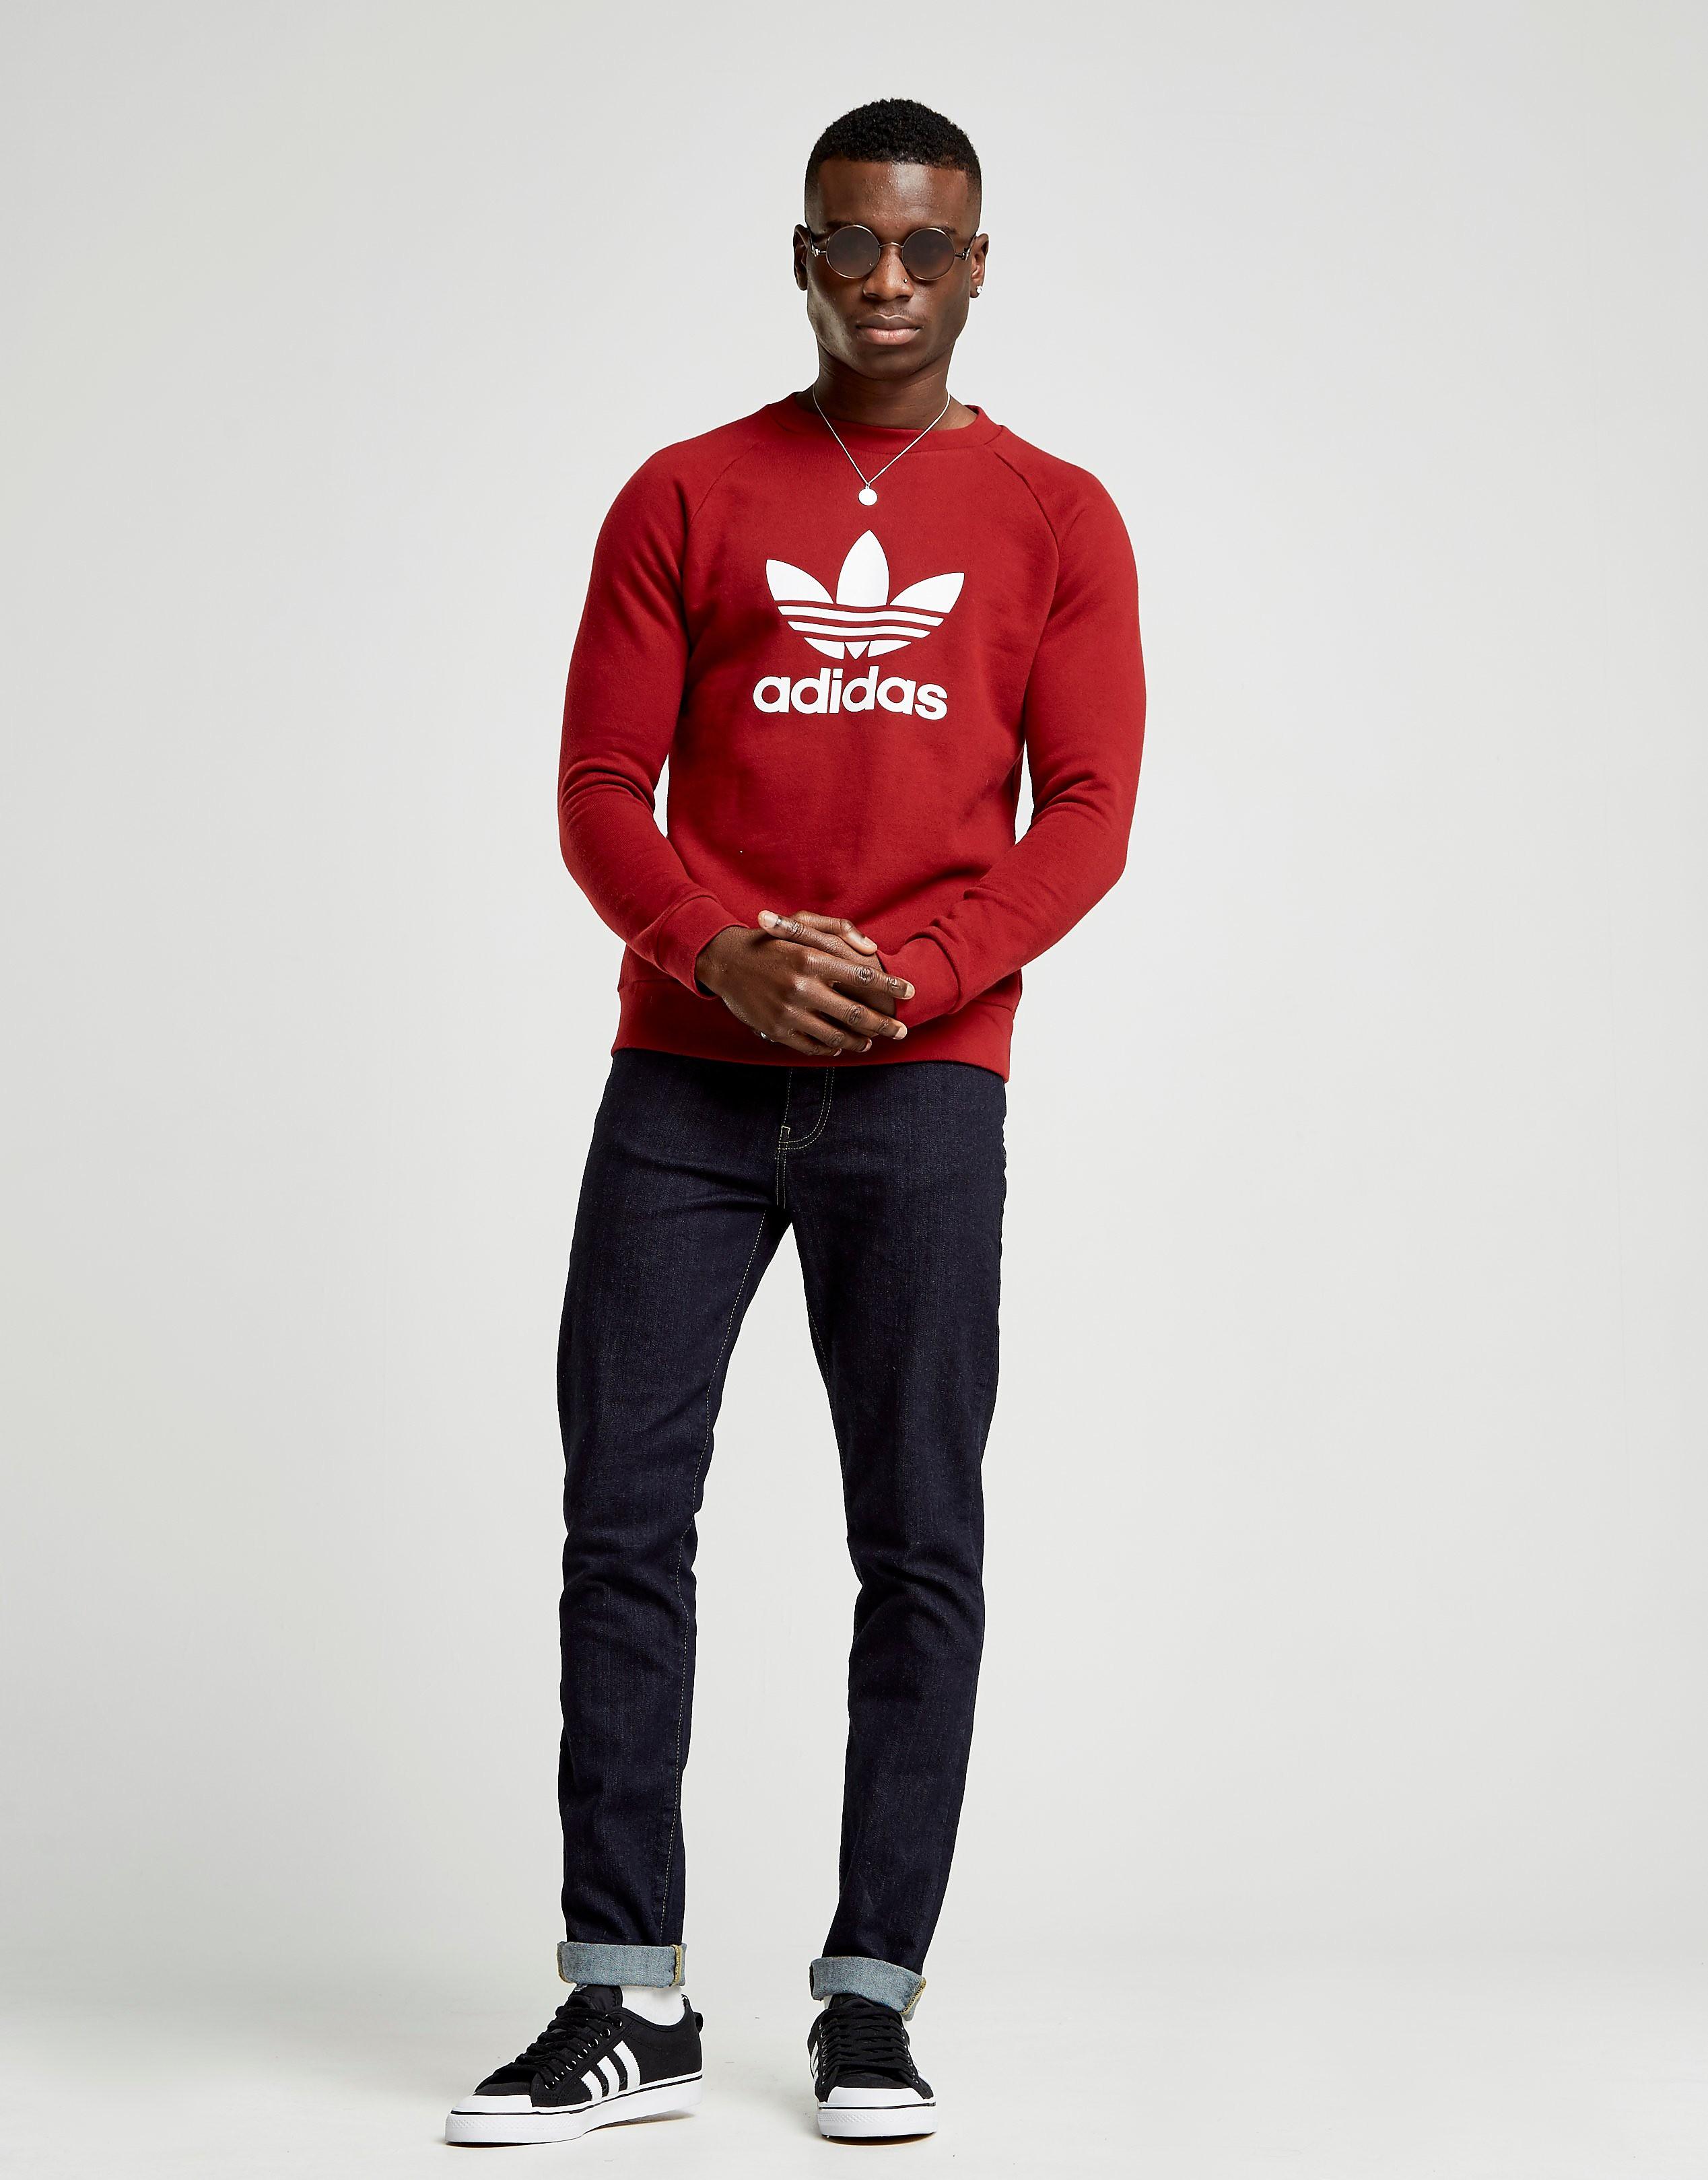 adidas Originals Trefoil Crew Sweatshirt Herre